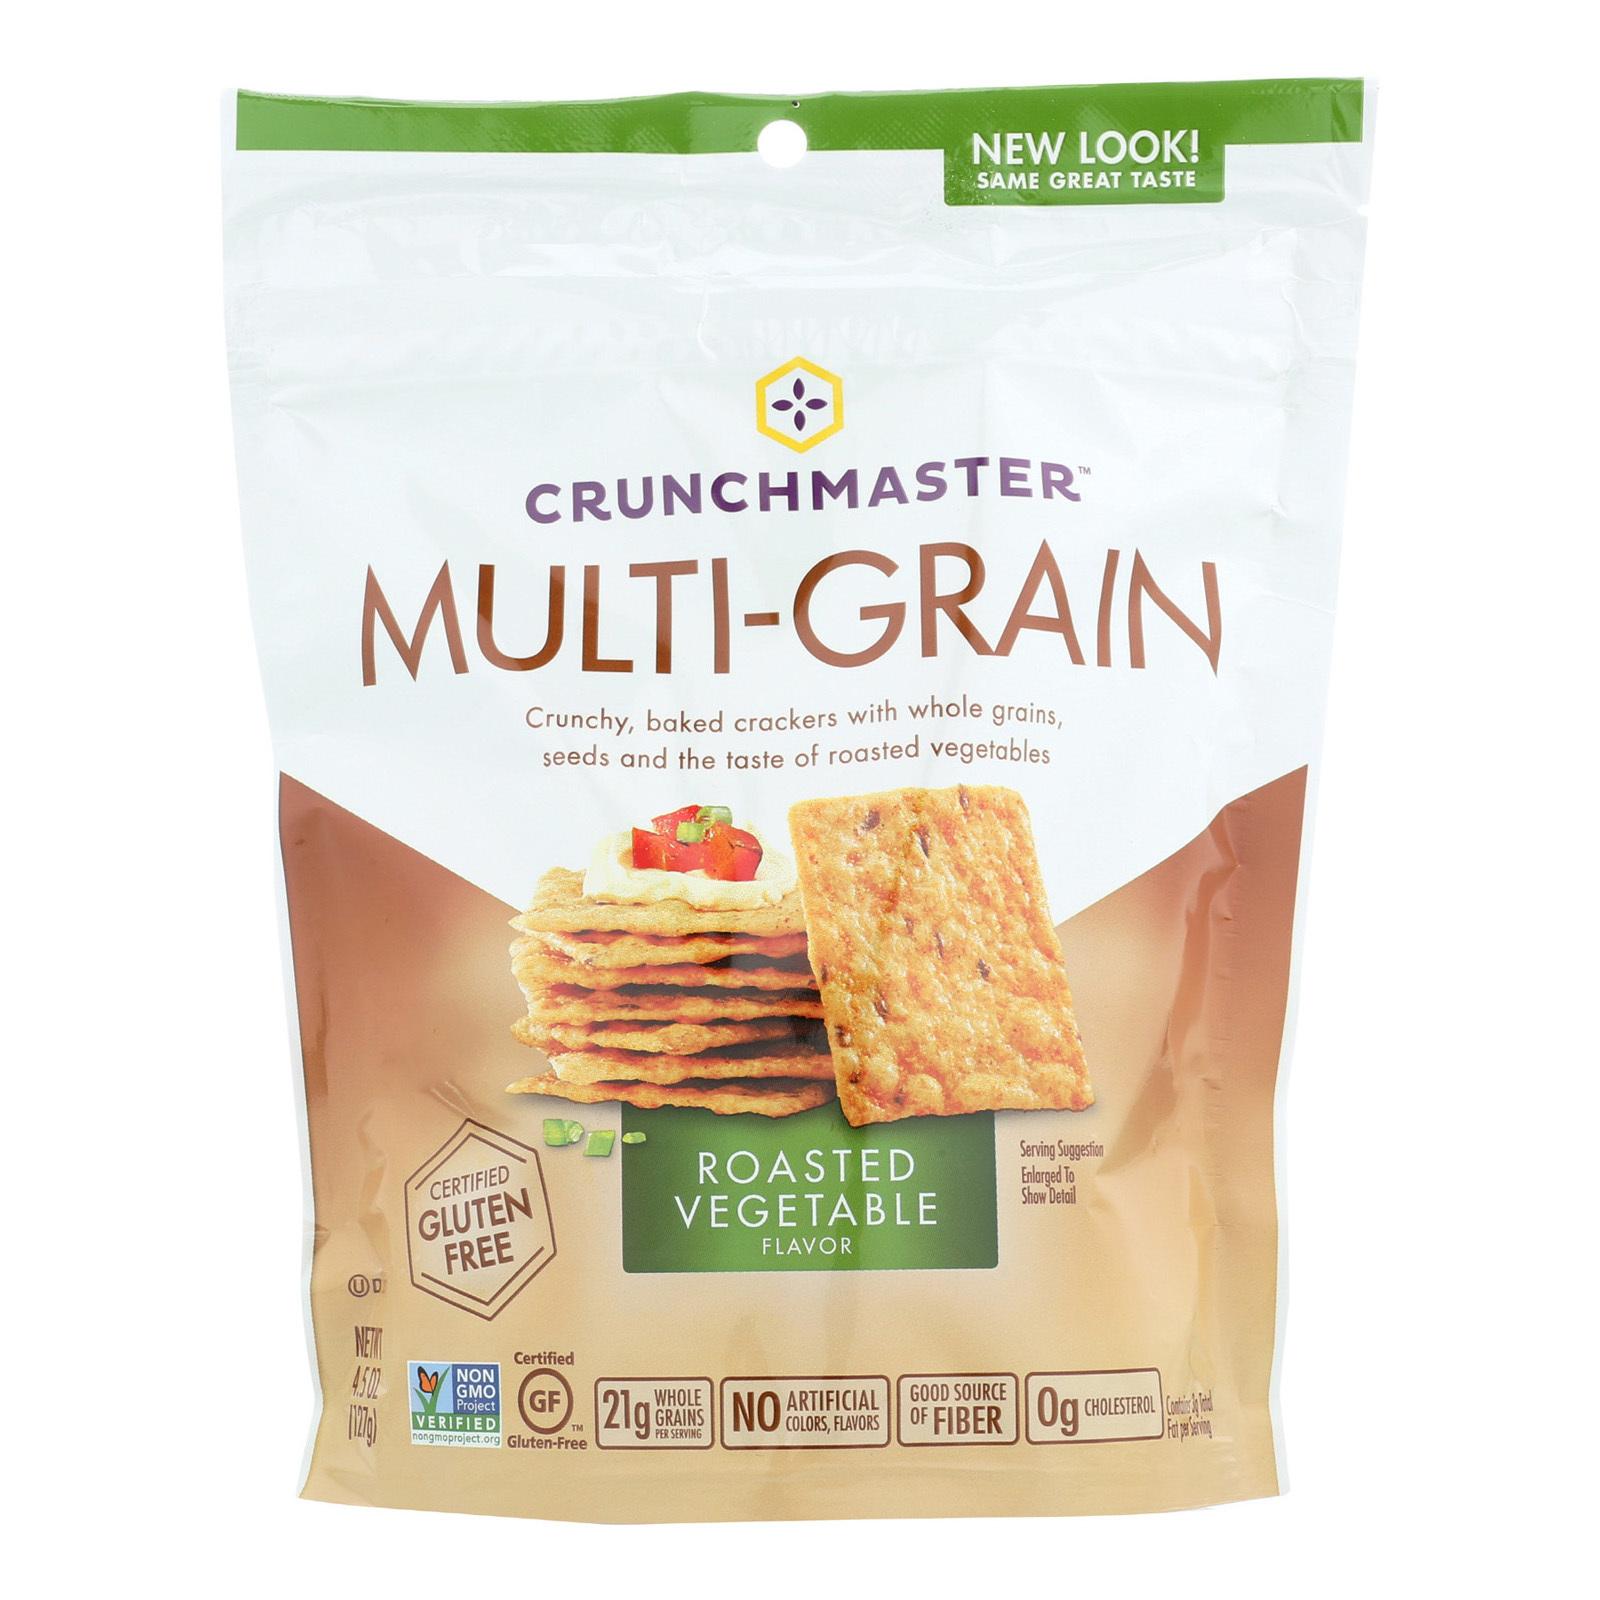 Crunchmaster Multi-Grain Crackers - Roasted Vegetable - Case of 12 - 4.5 oz.